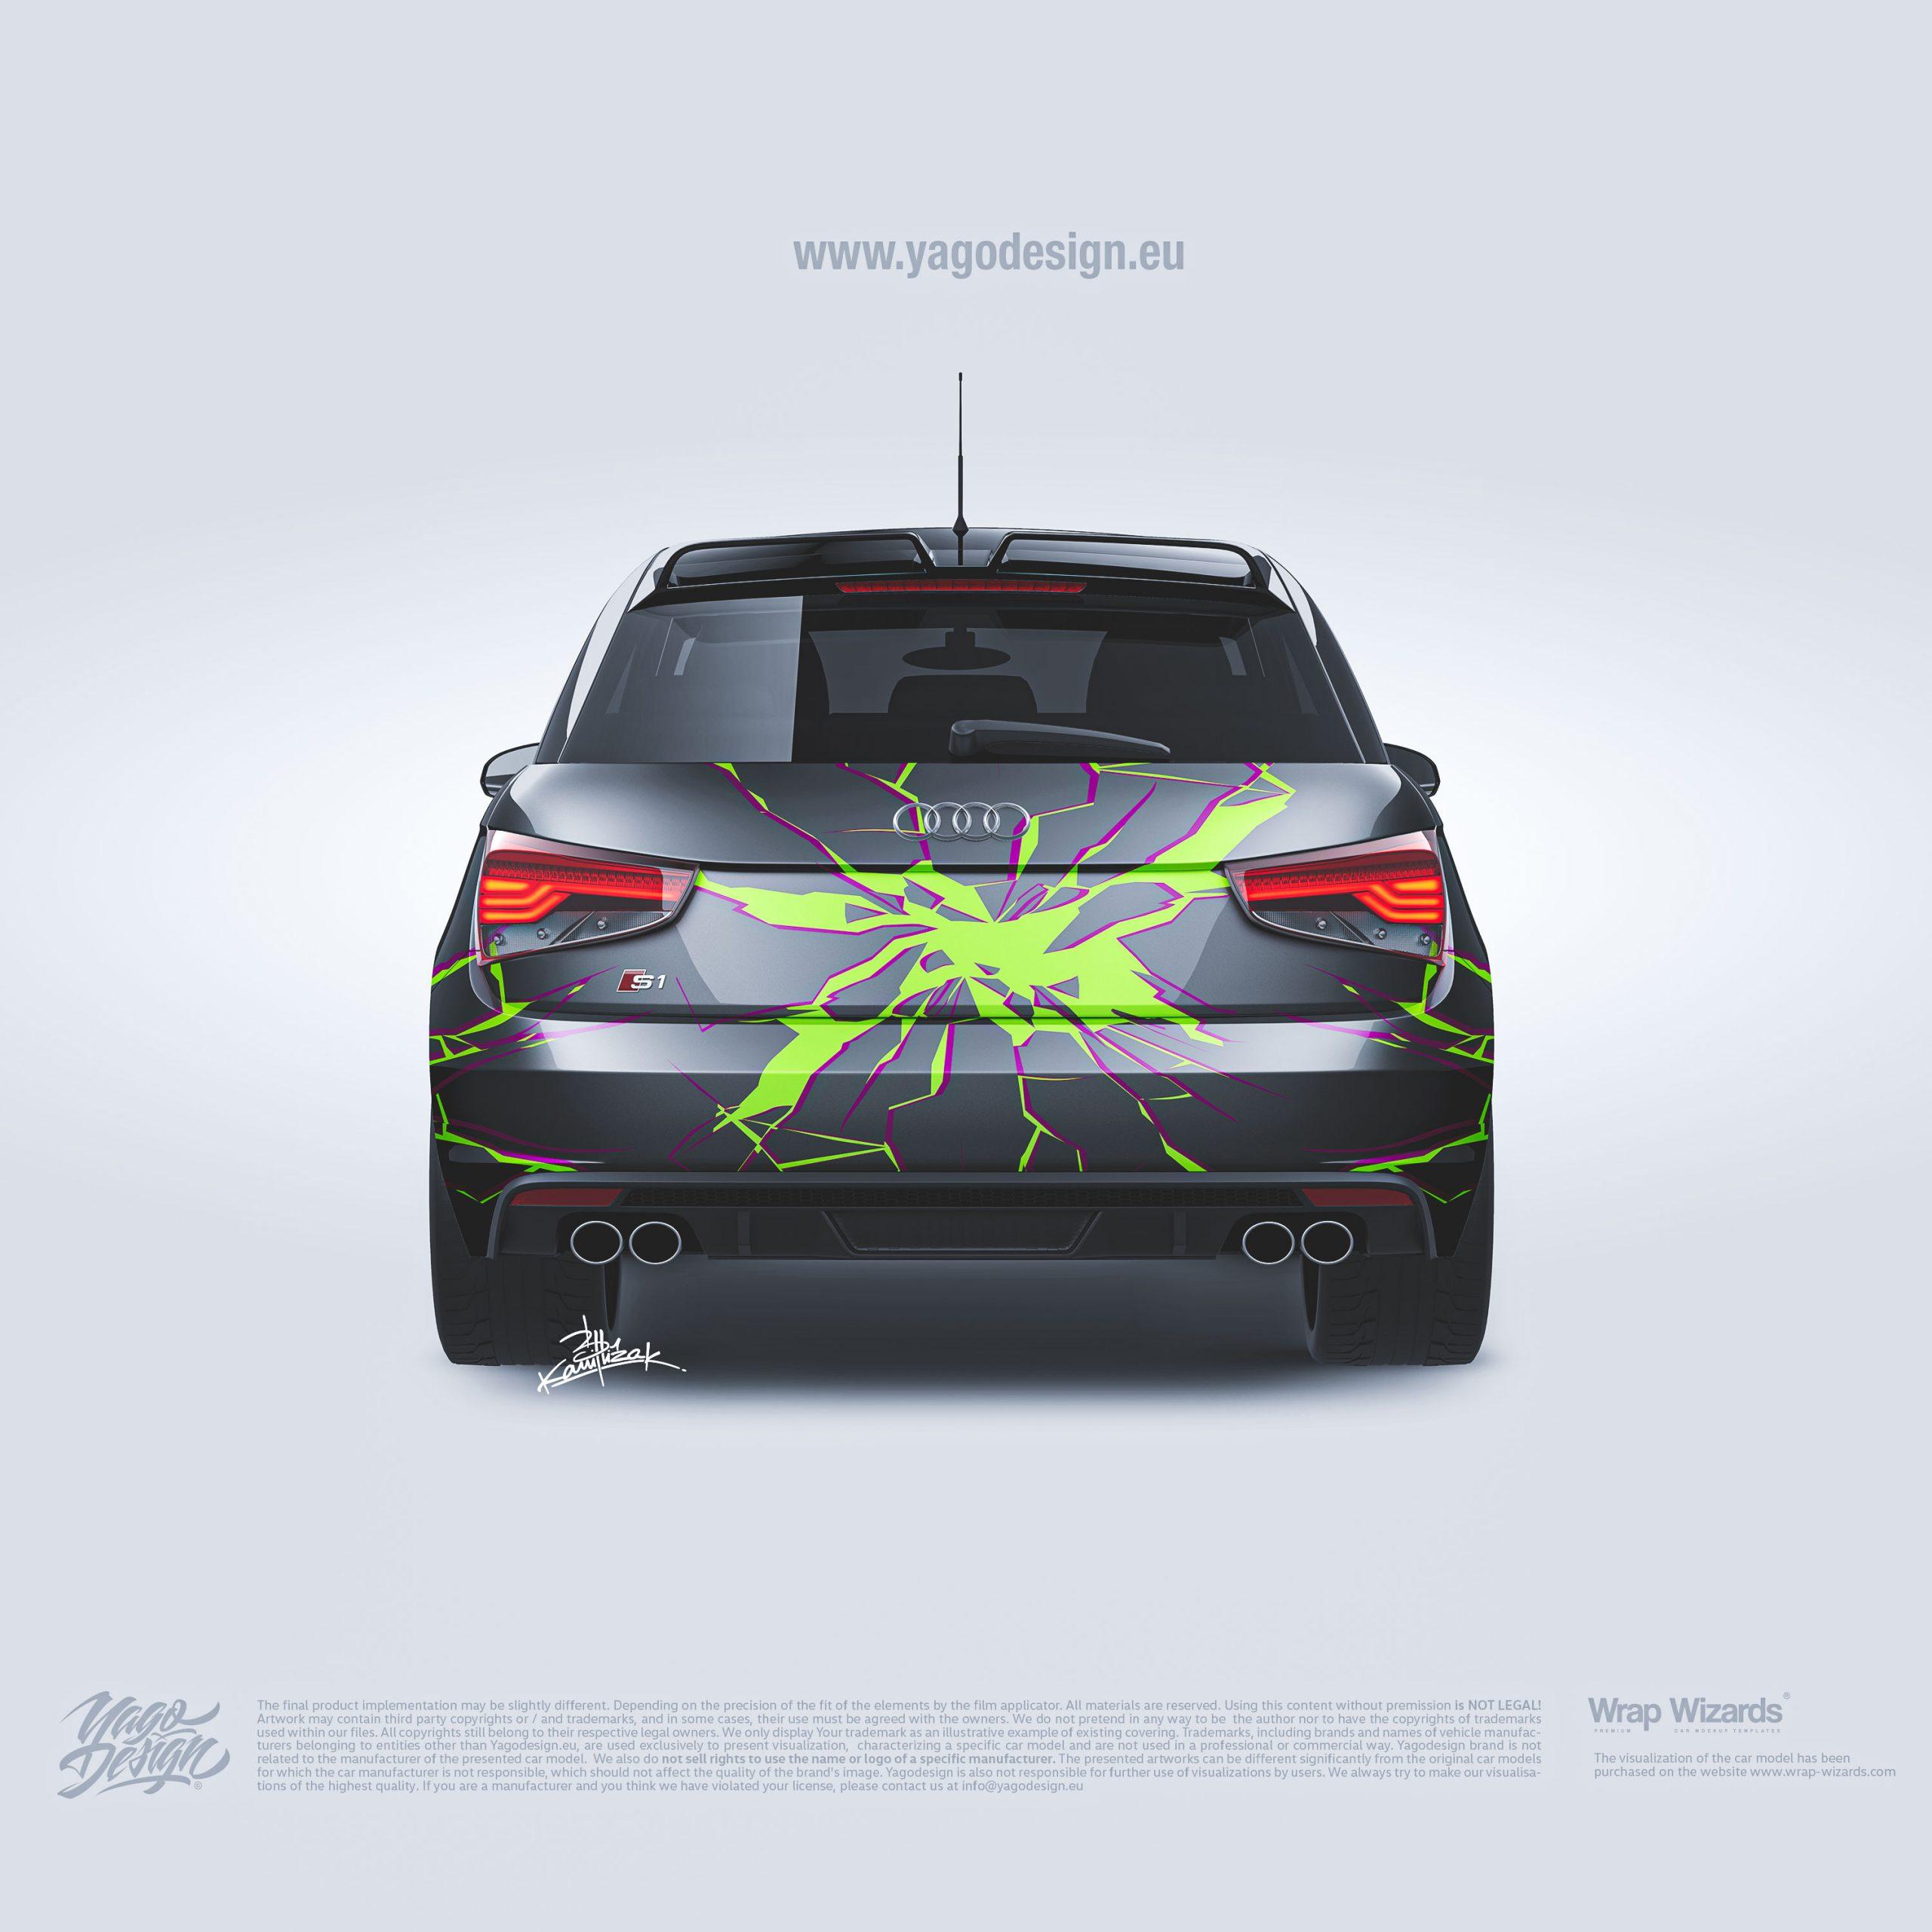 Audi-A1-Sportback-by-Yagodesign-Automotive-Design-Studio4-scaled